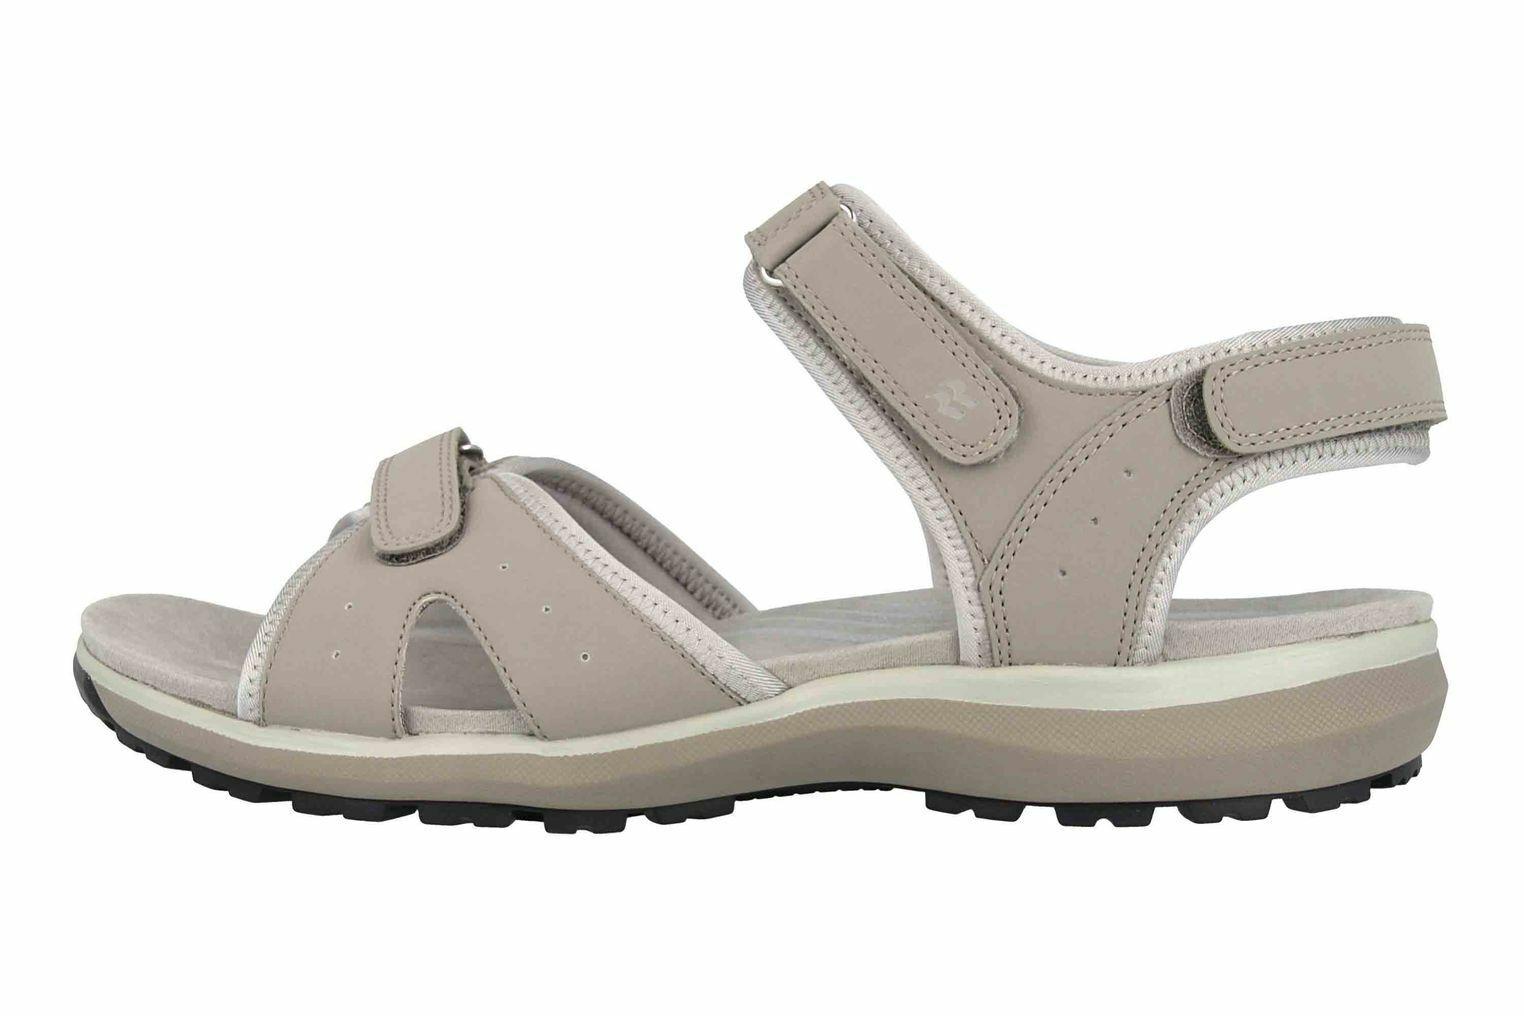 Romika Olivia 07 Sandalen in Übergrößen Grau 78307 78 720 große Damenschuhe